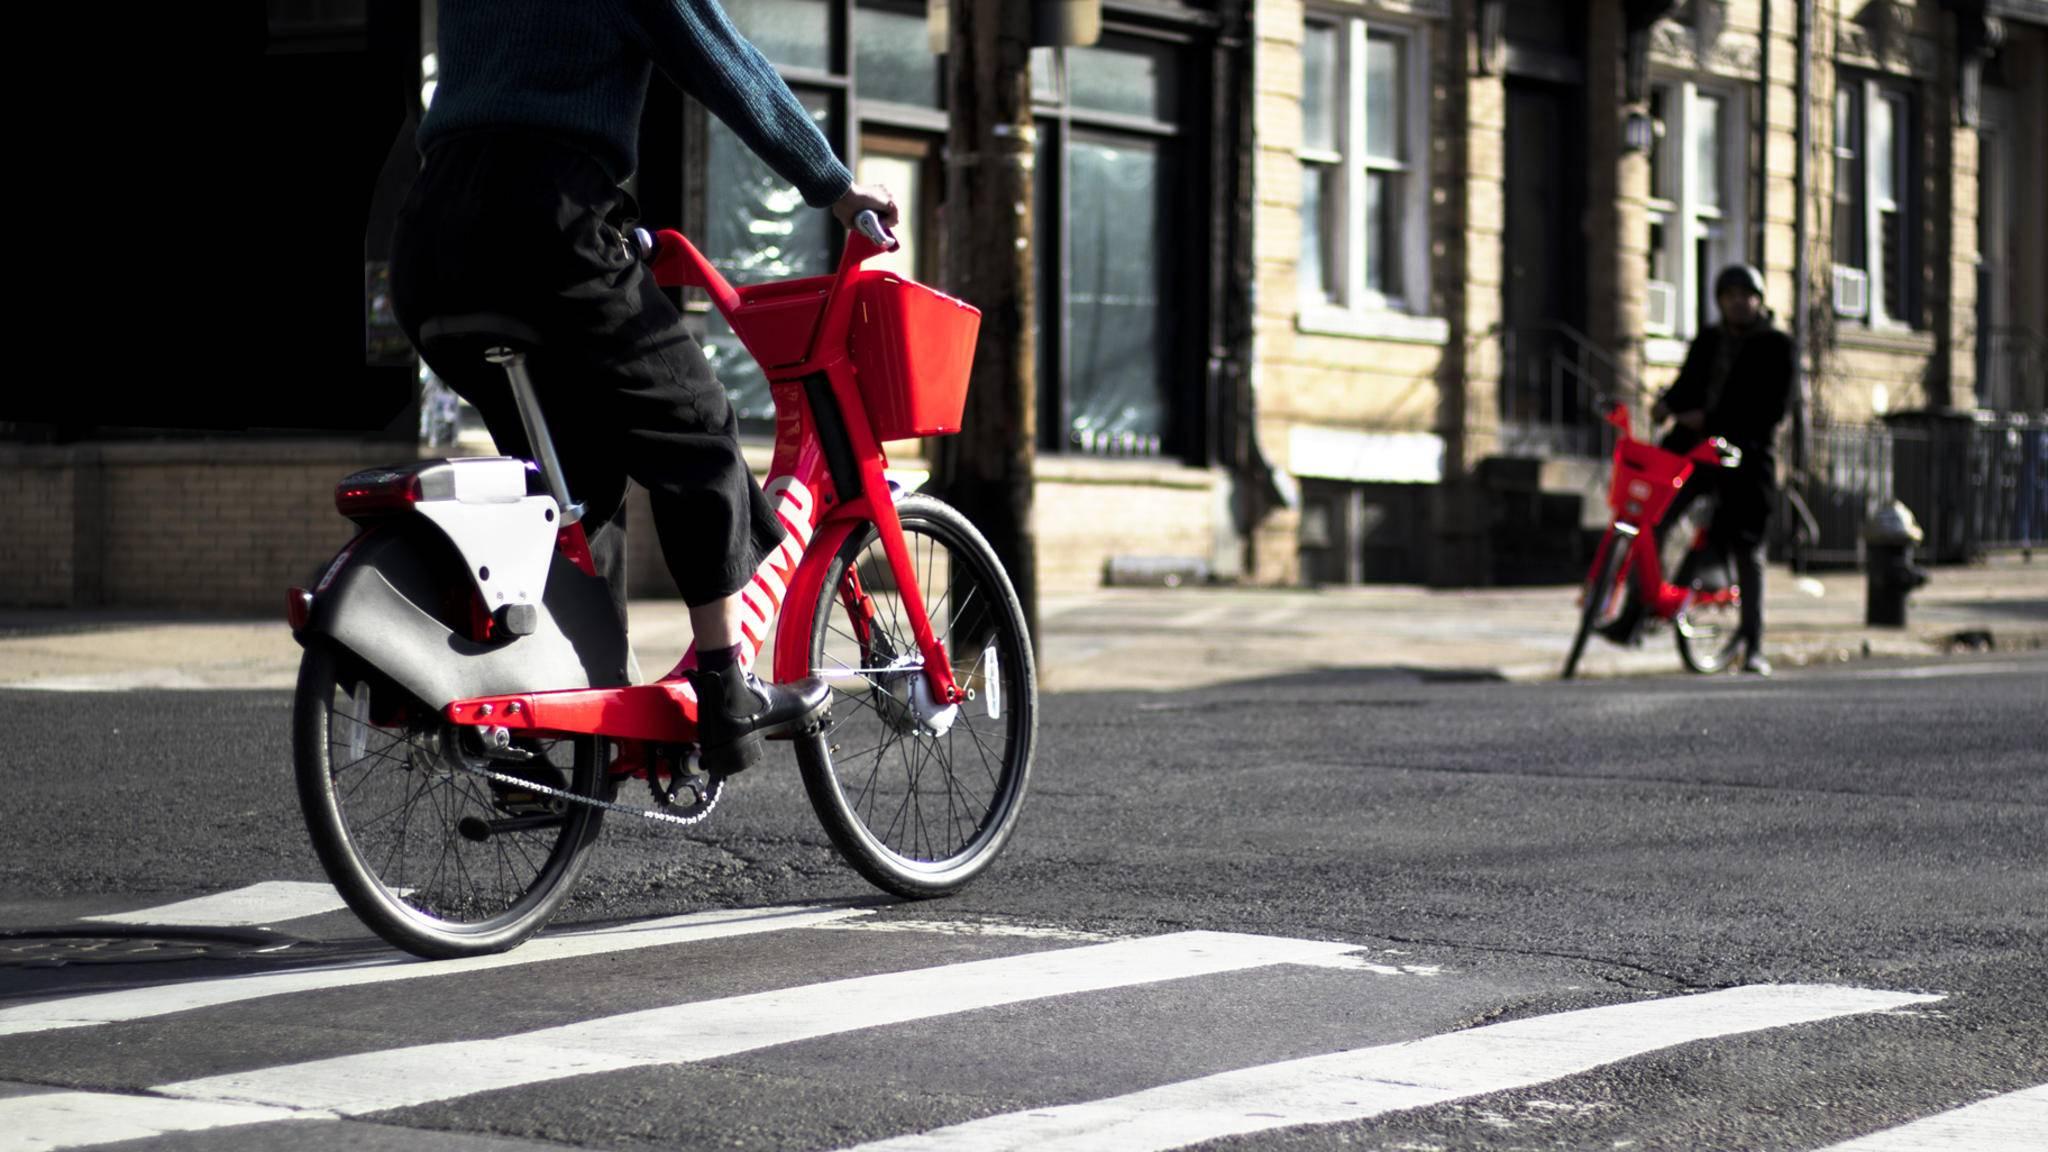 Bald düsen Ubers Jump-Bikes über Berliner Straßen.